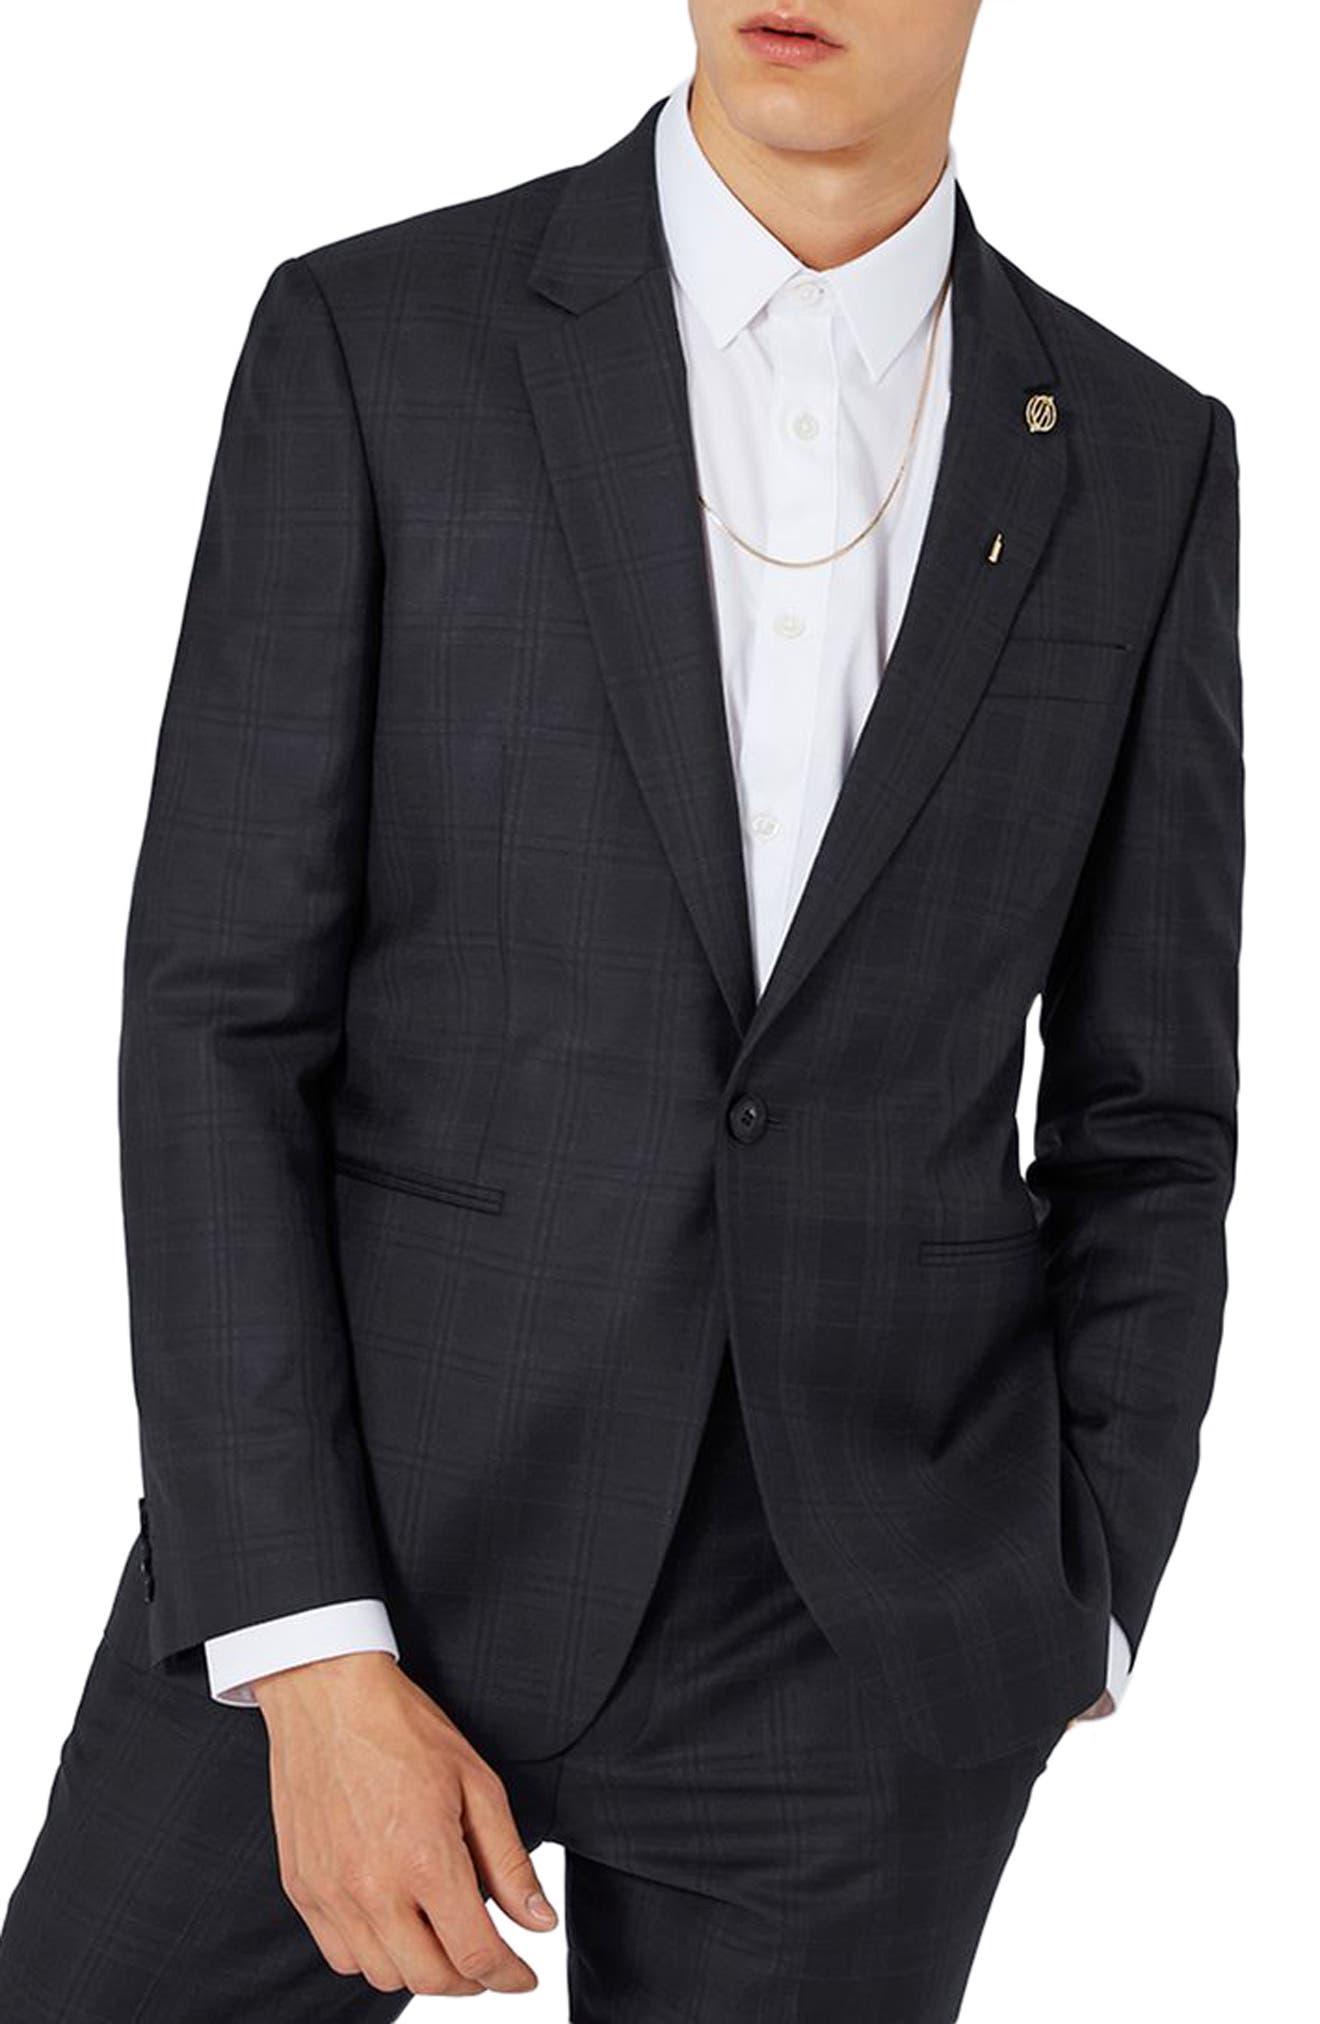 TOPMAN Charlie Casely-Hayford x Topman Skinny Fit Check Suit Jacket